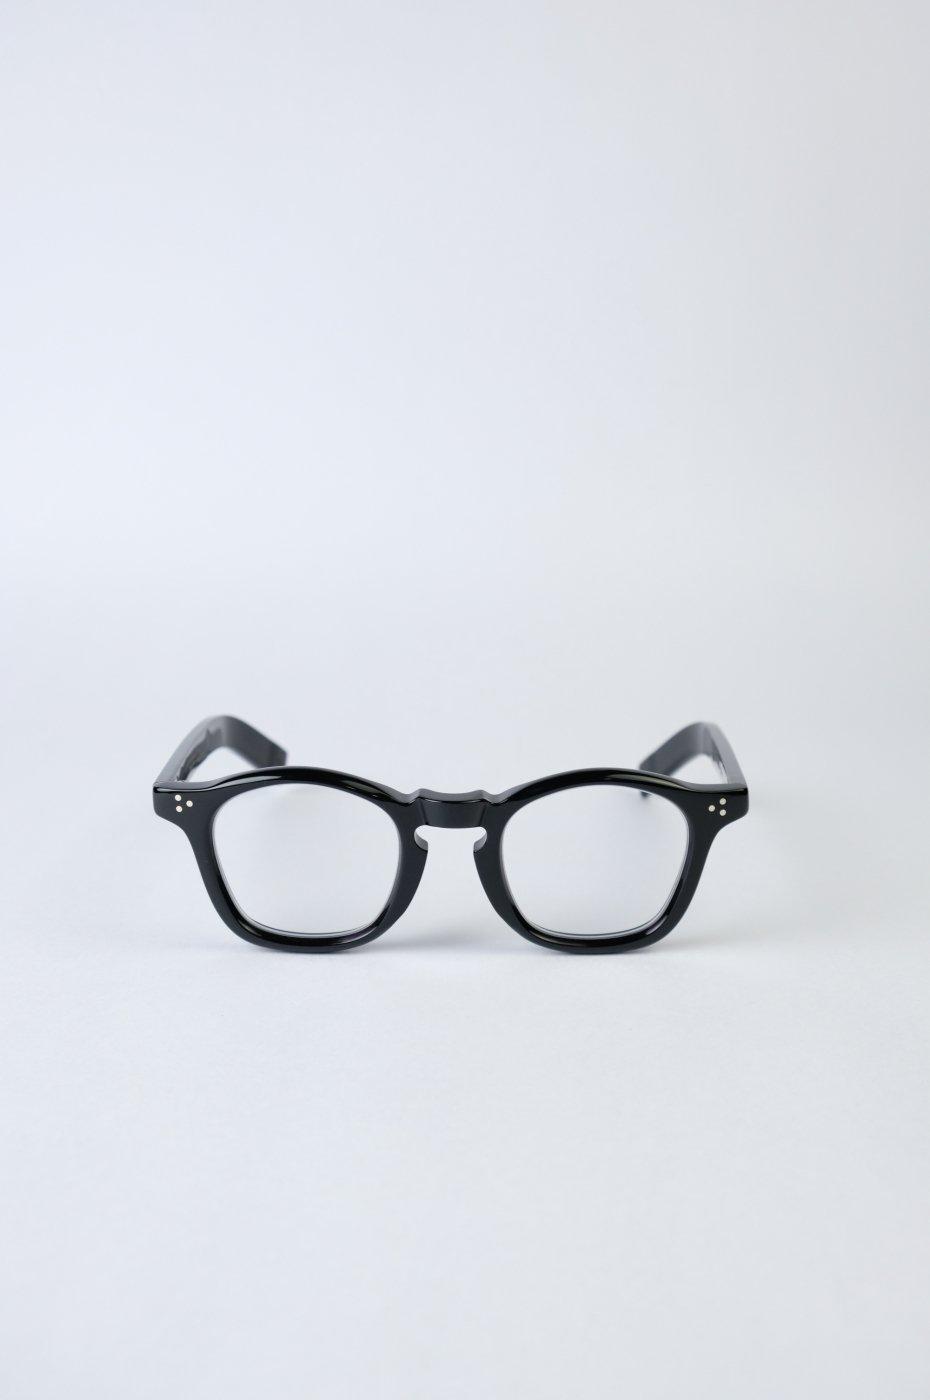 guépard ギュパール-gp-05-Noir-Clear Lens-